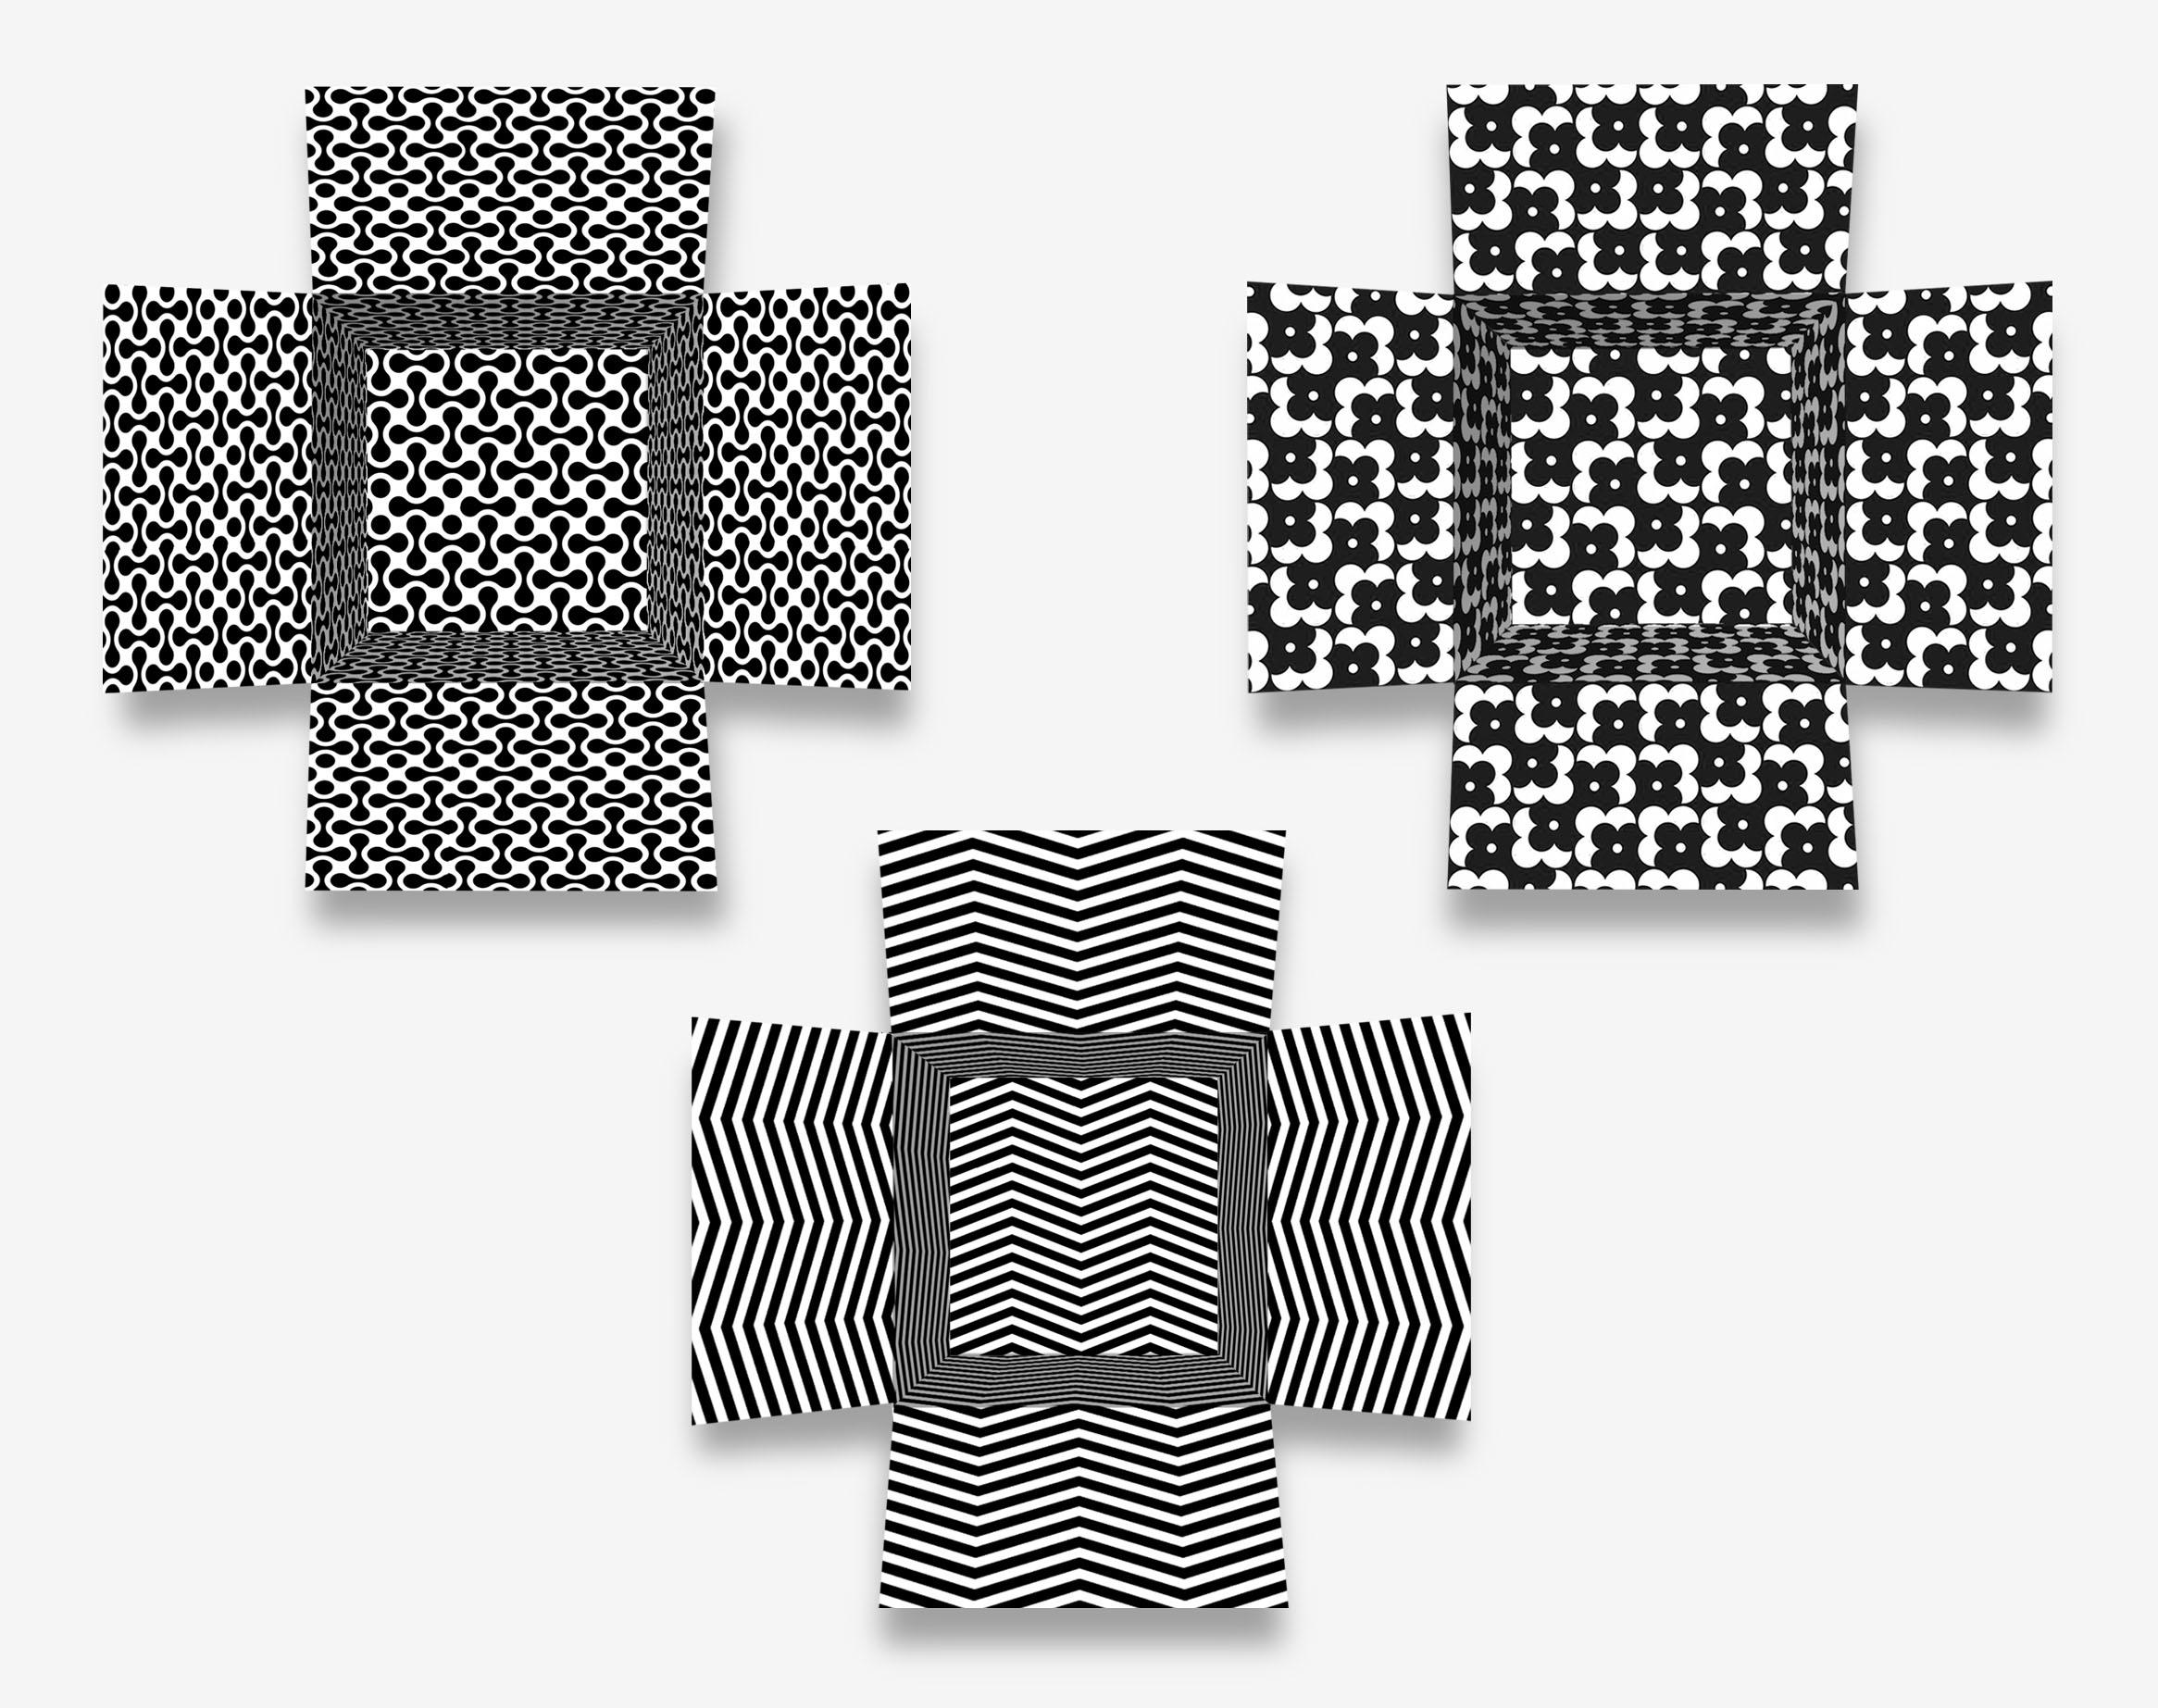 willcandle_boxinsides_patterns.jpg